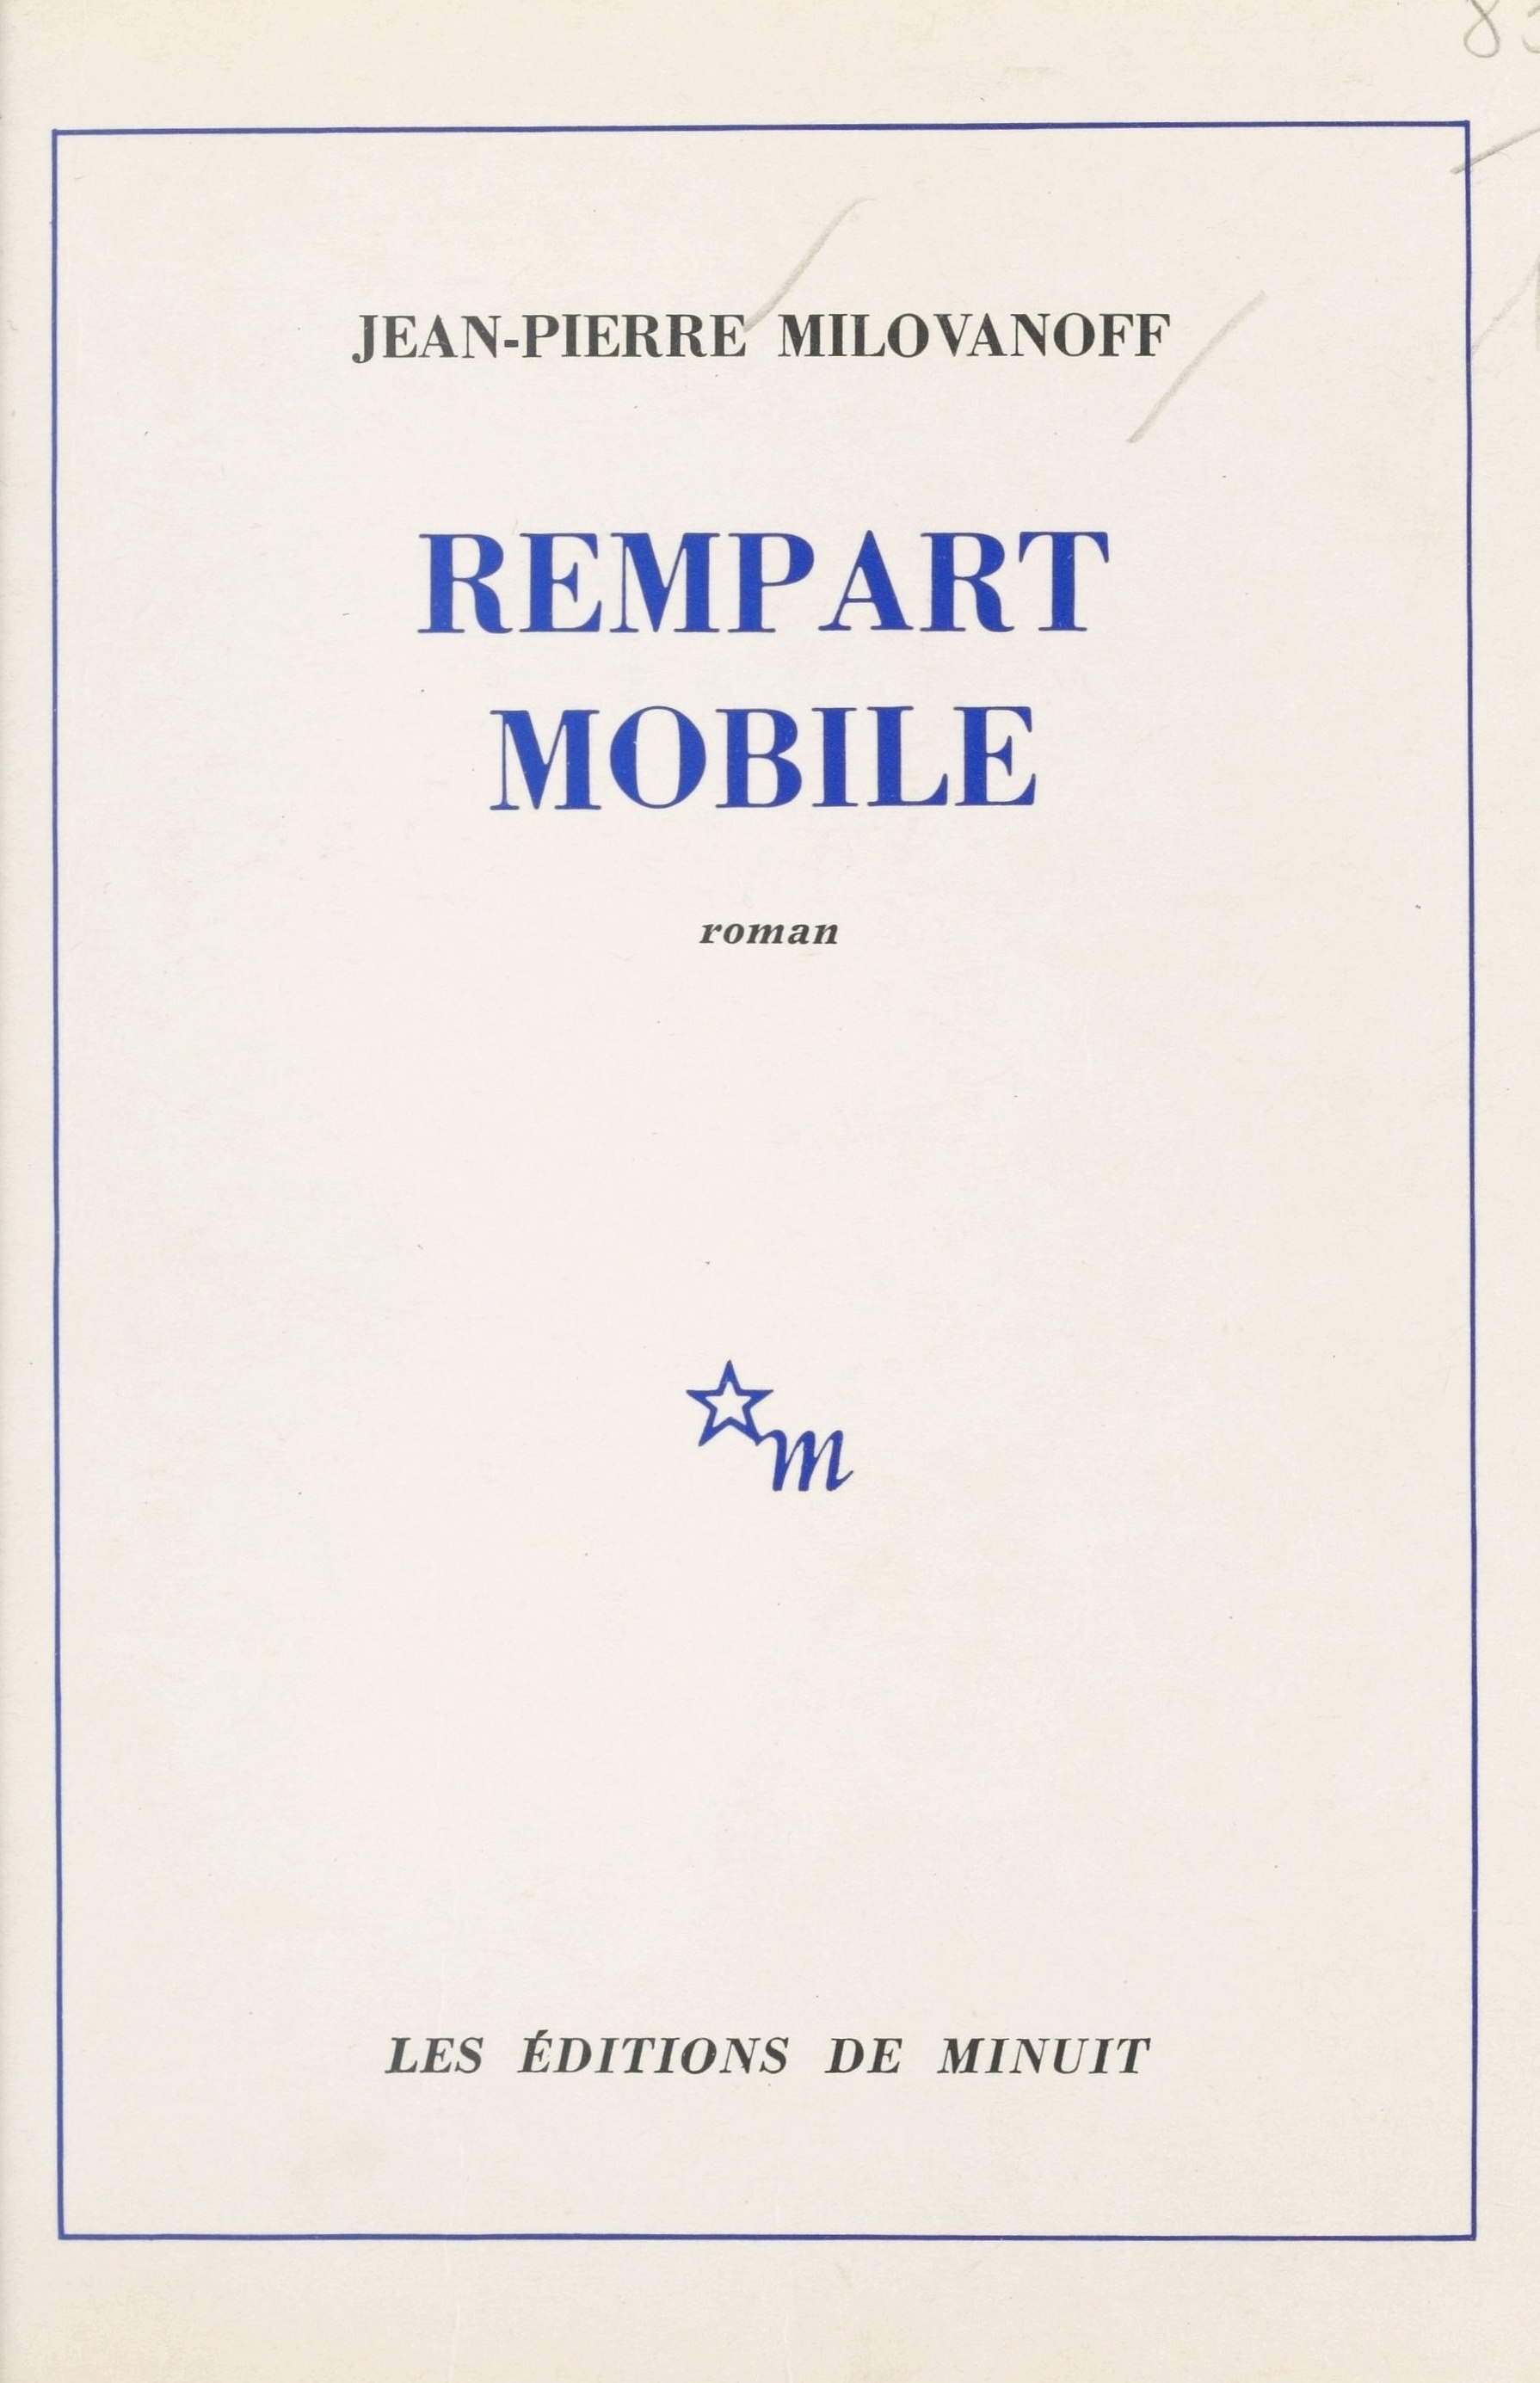 Rempart mobile